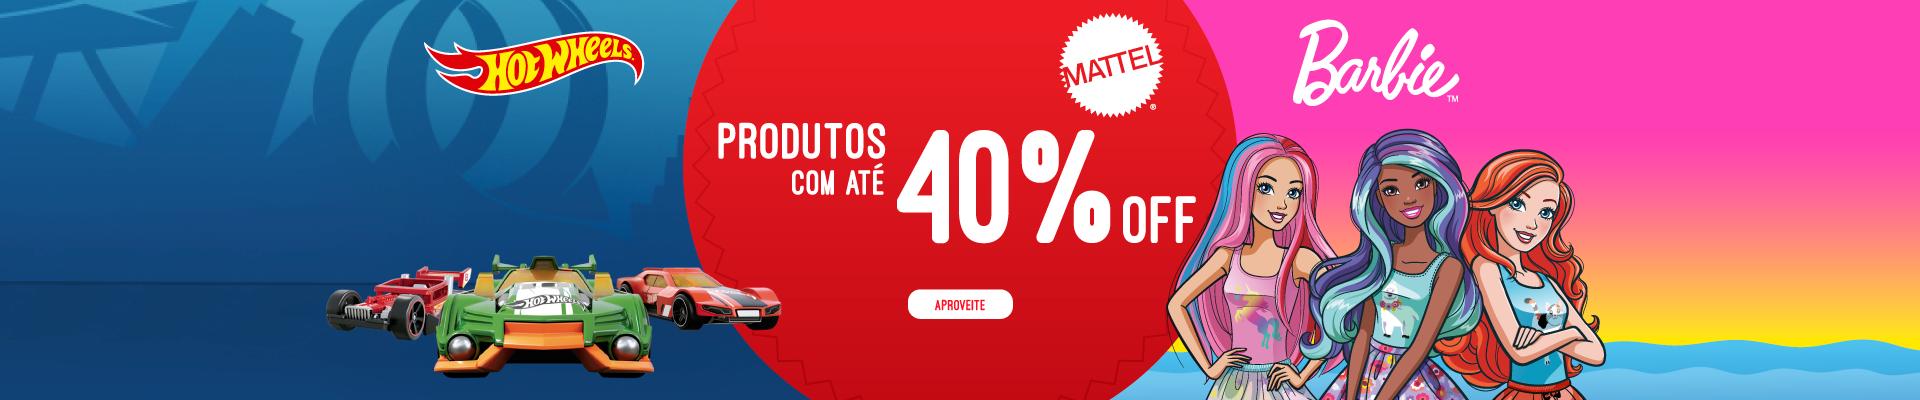 MATTEL 40%